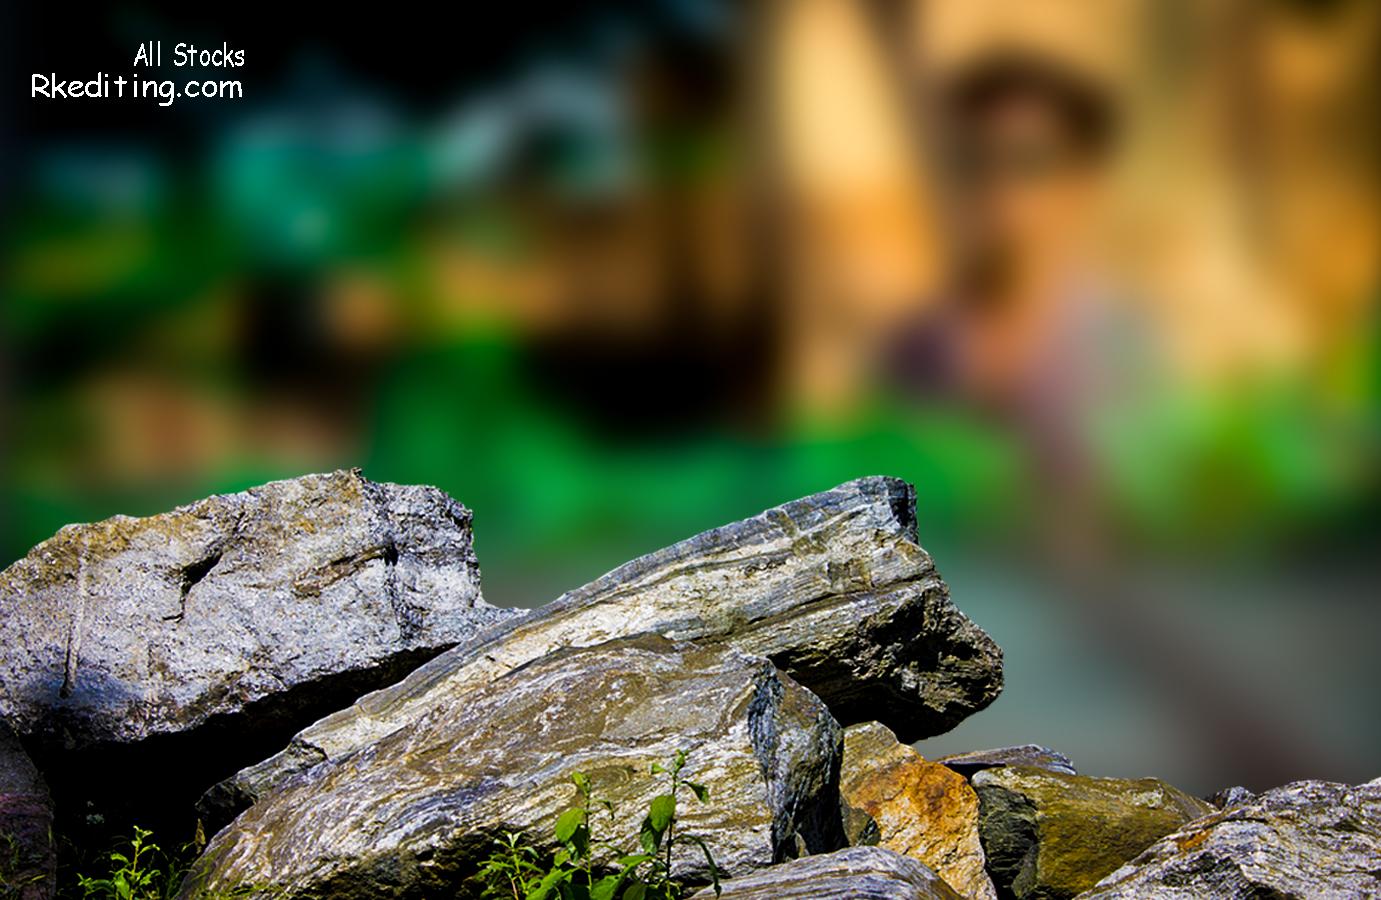 cb backgrounds, hd desktop backgrounds, photoshop editing